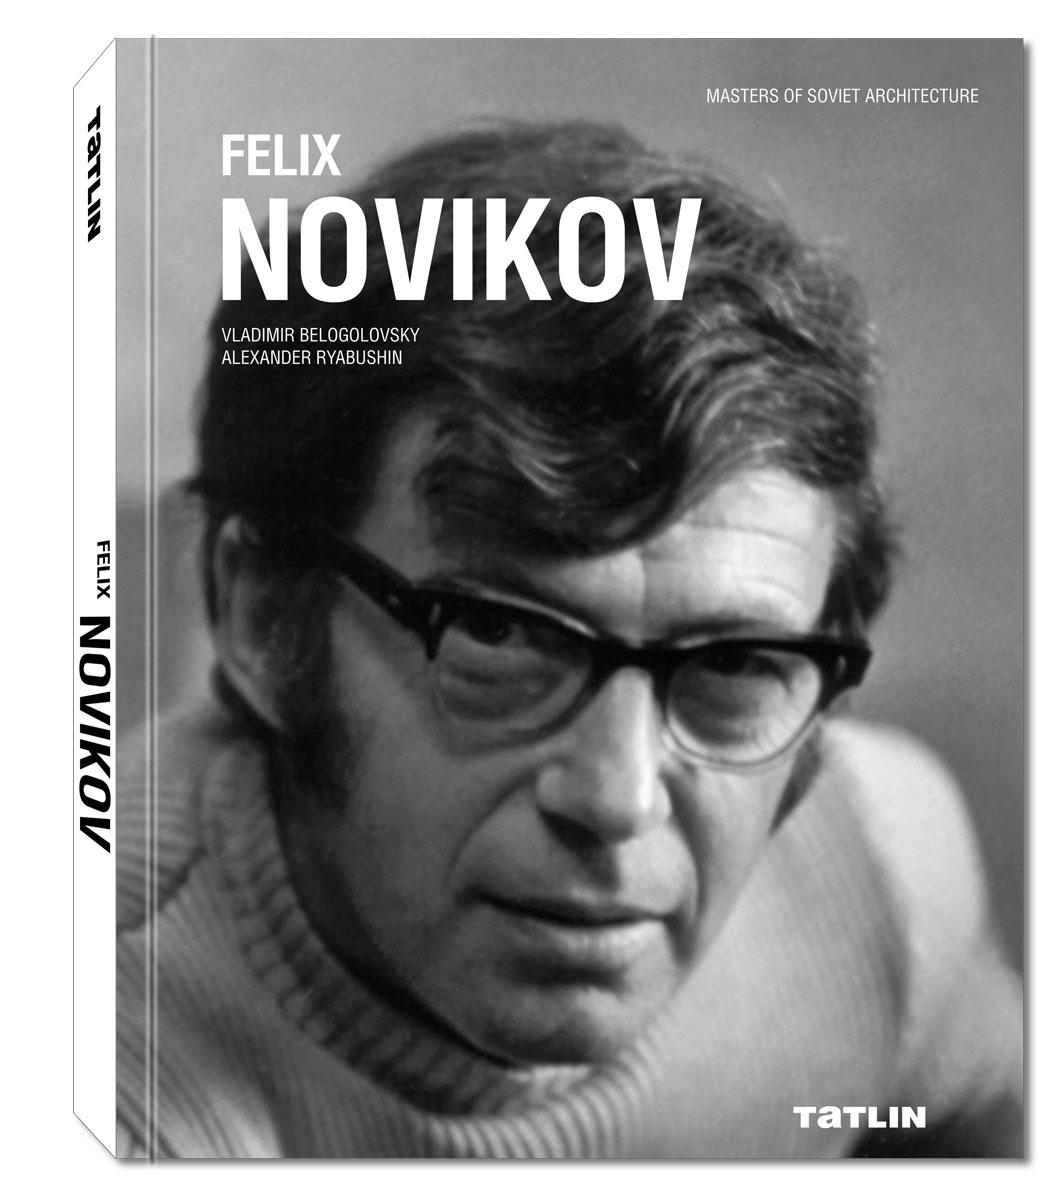 Феликс Новиков / Felix Novikov